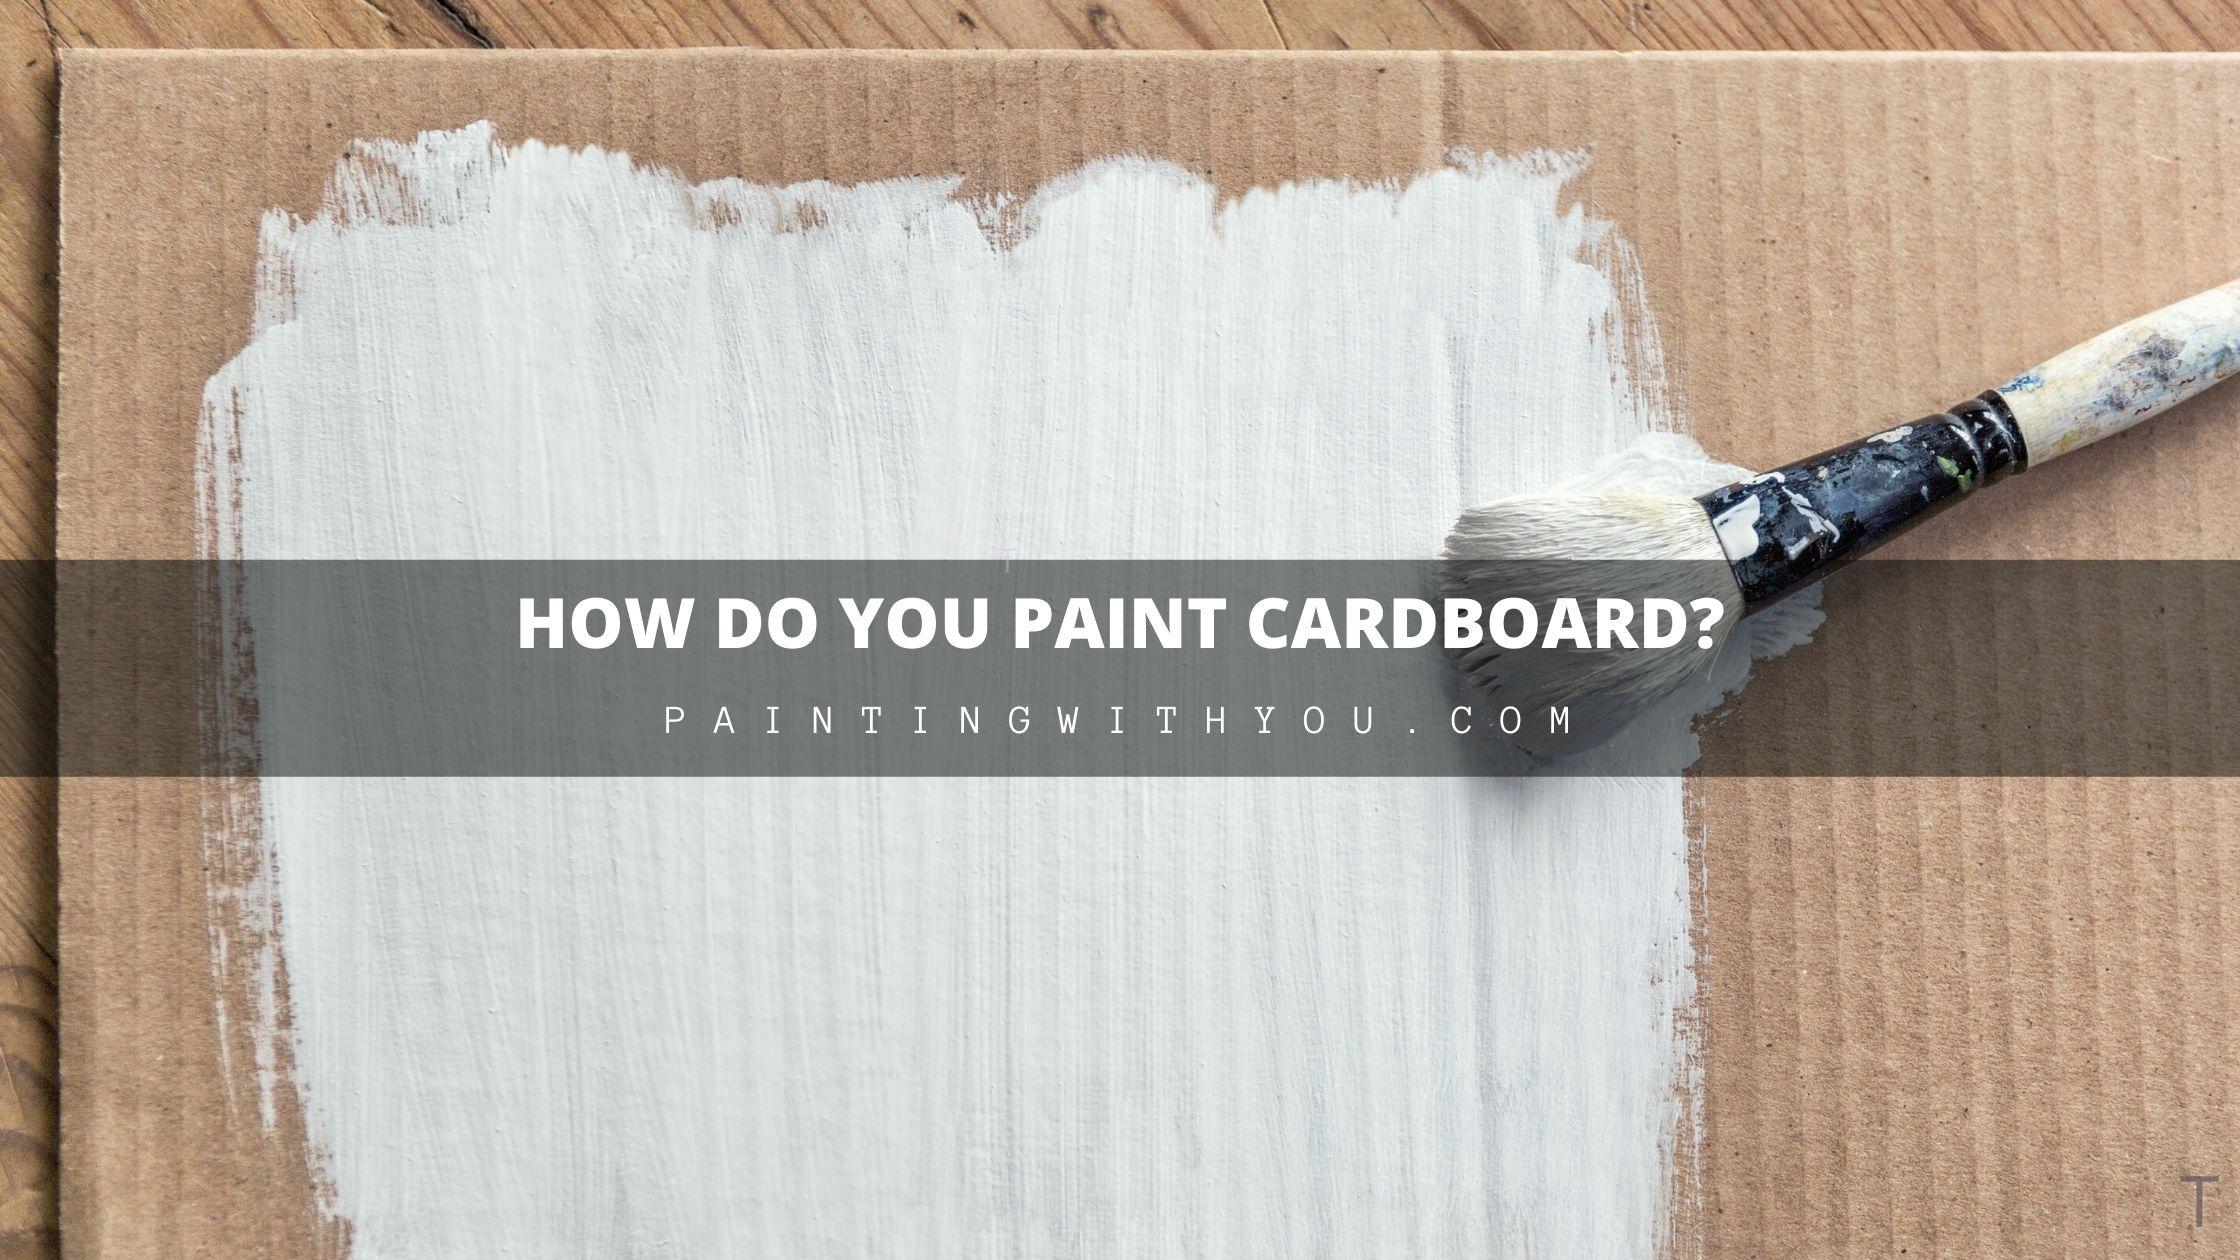 How do you paint cardboard?